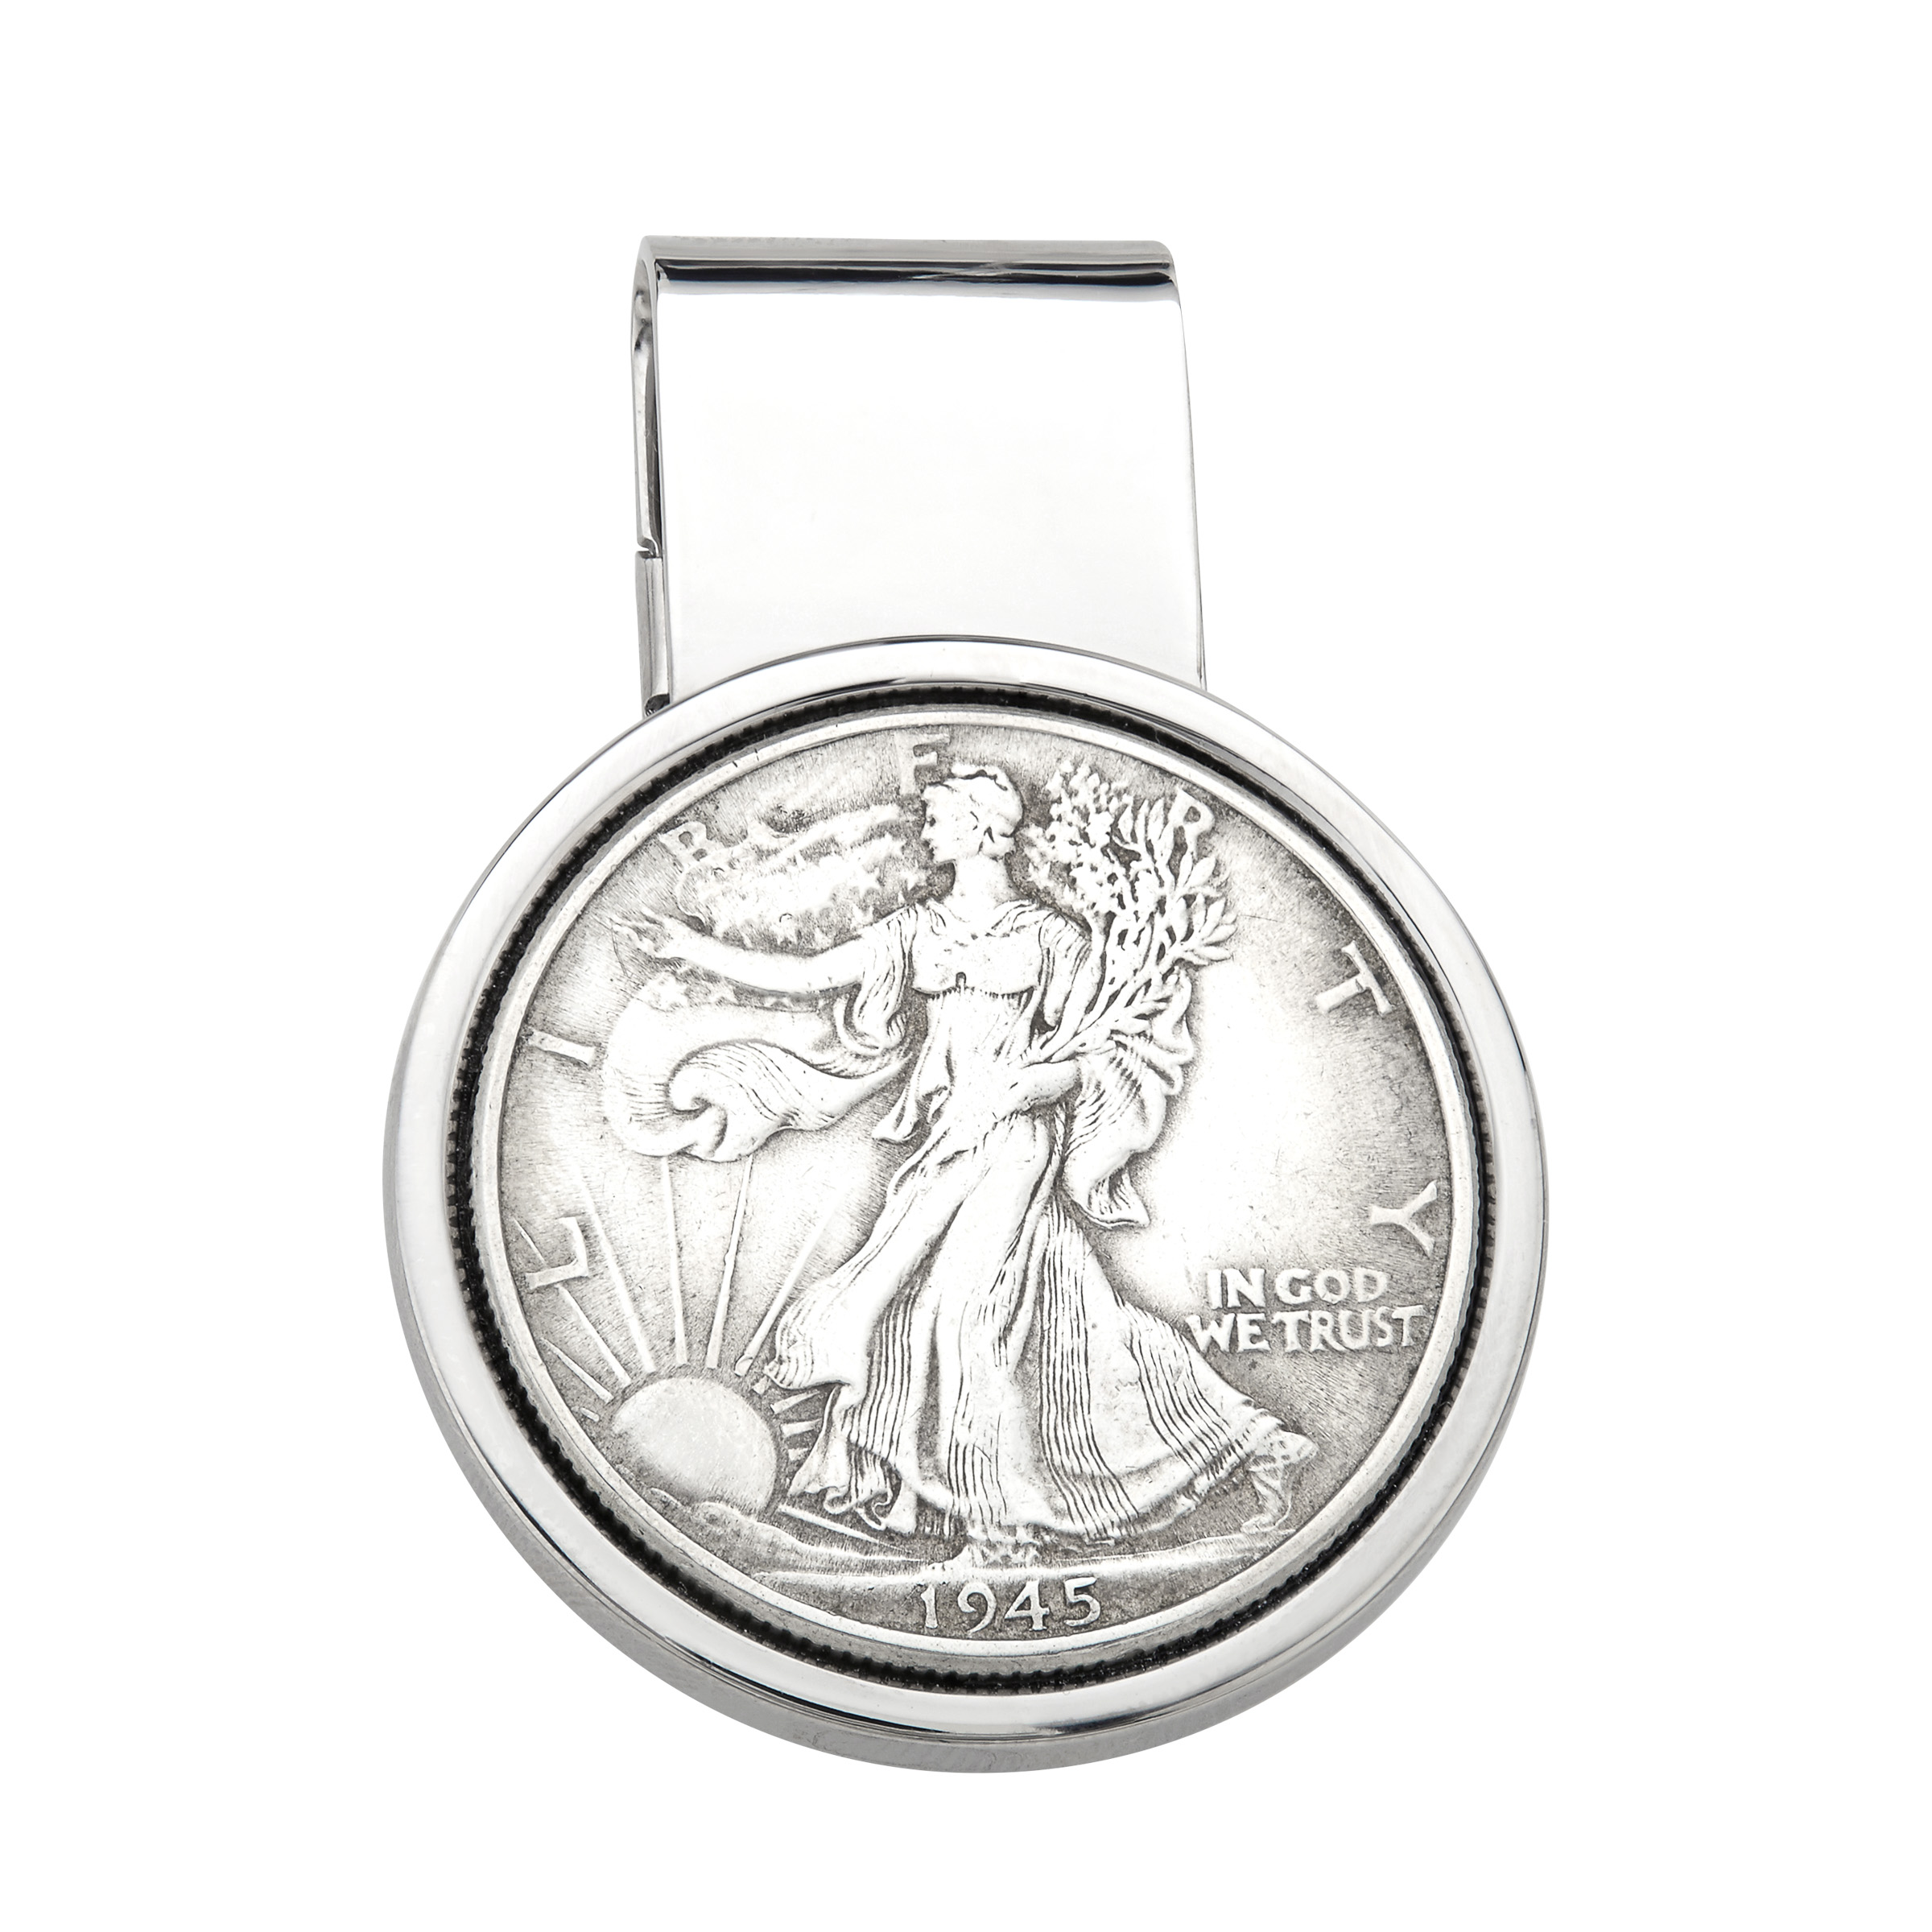 Richline Dolan Bullock Walking Liberty Coin Money Clip in...